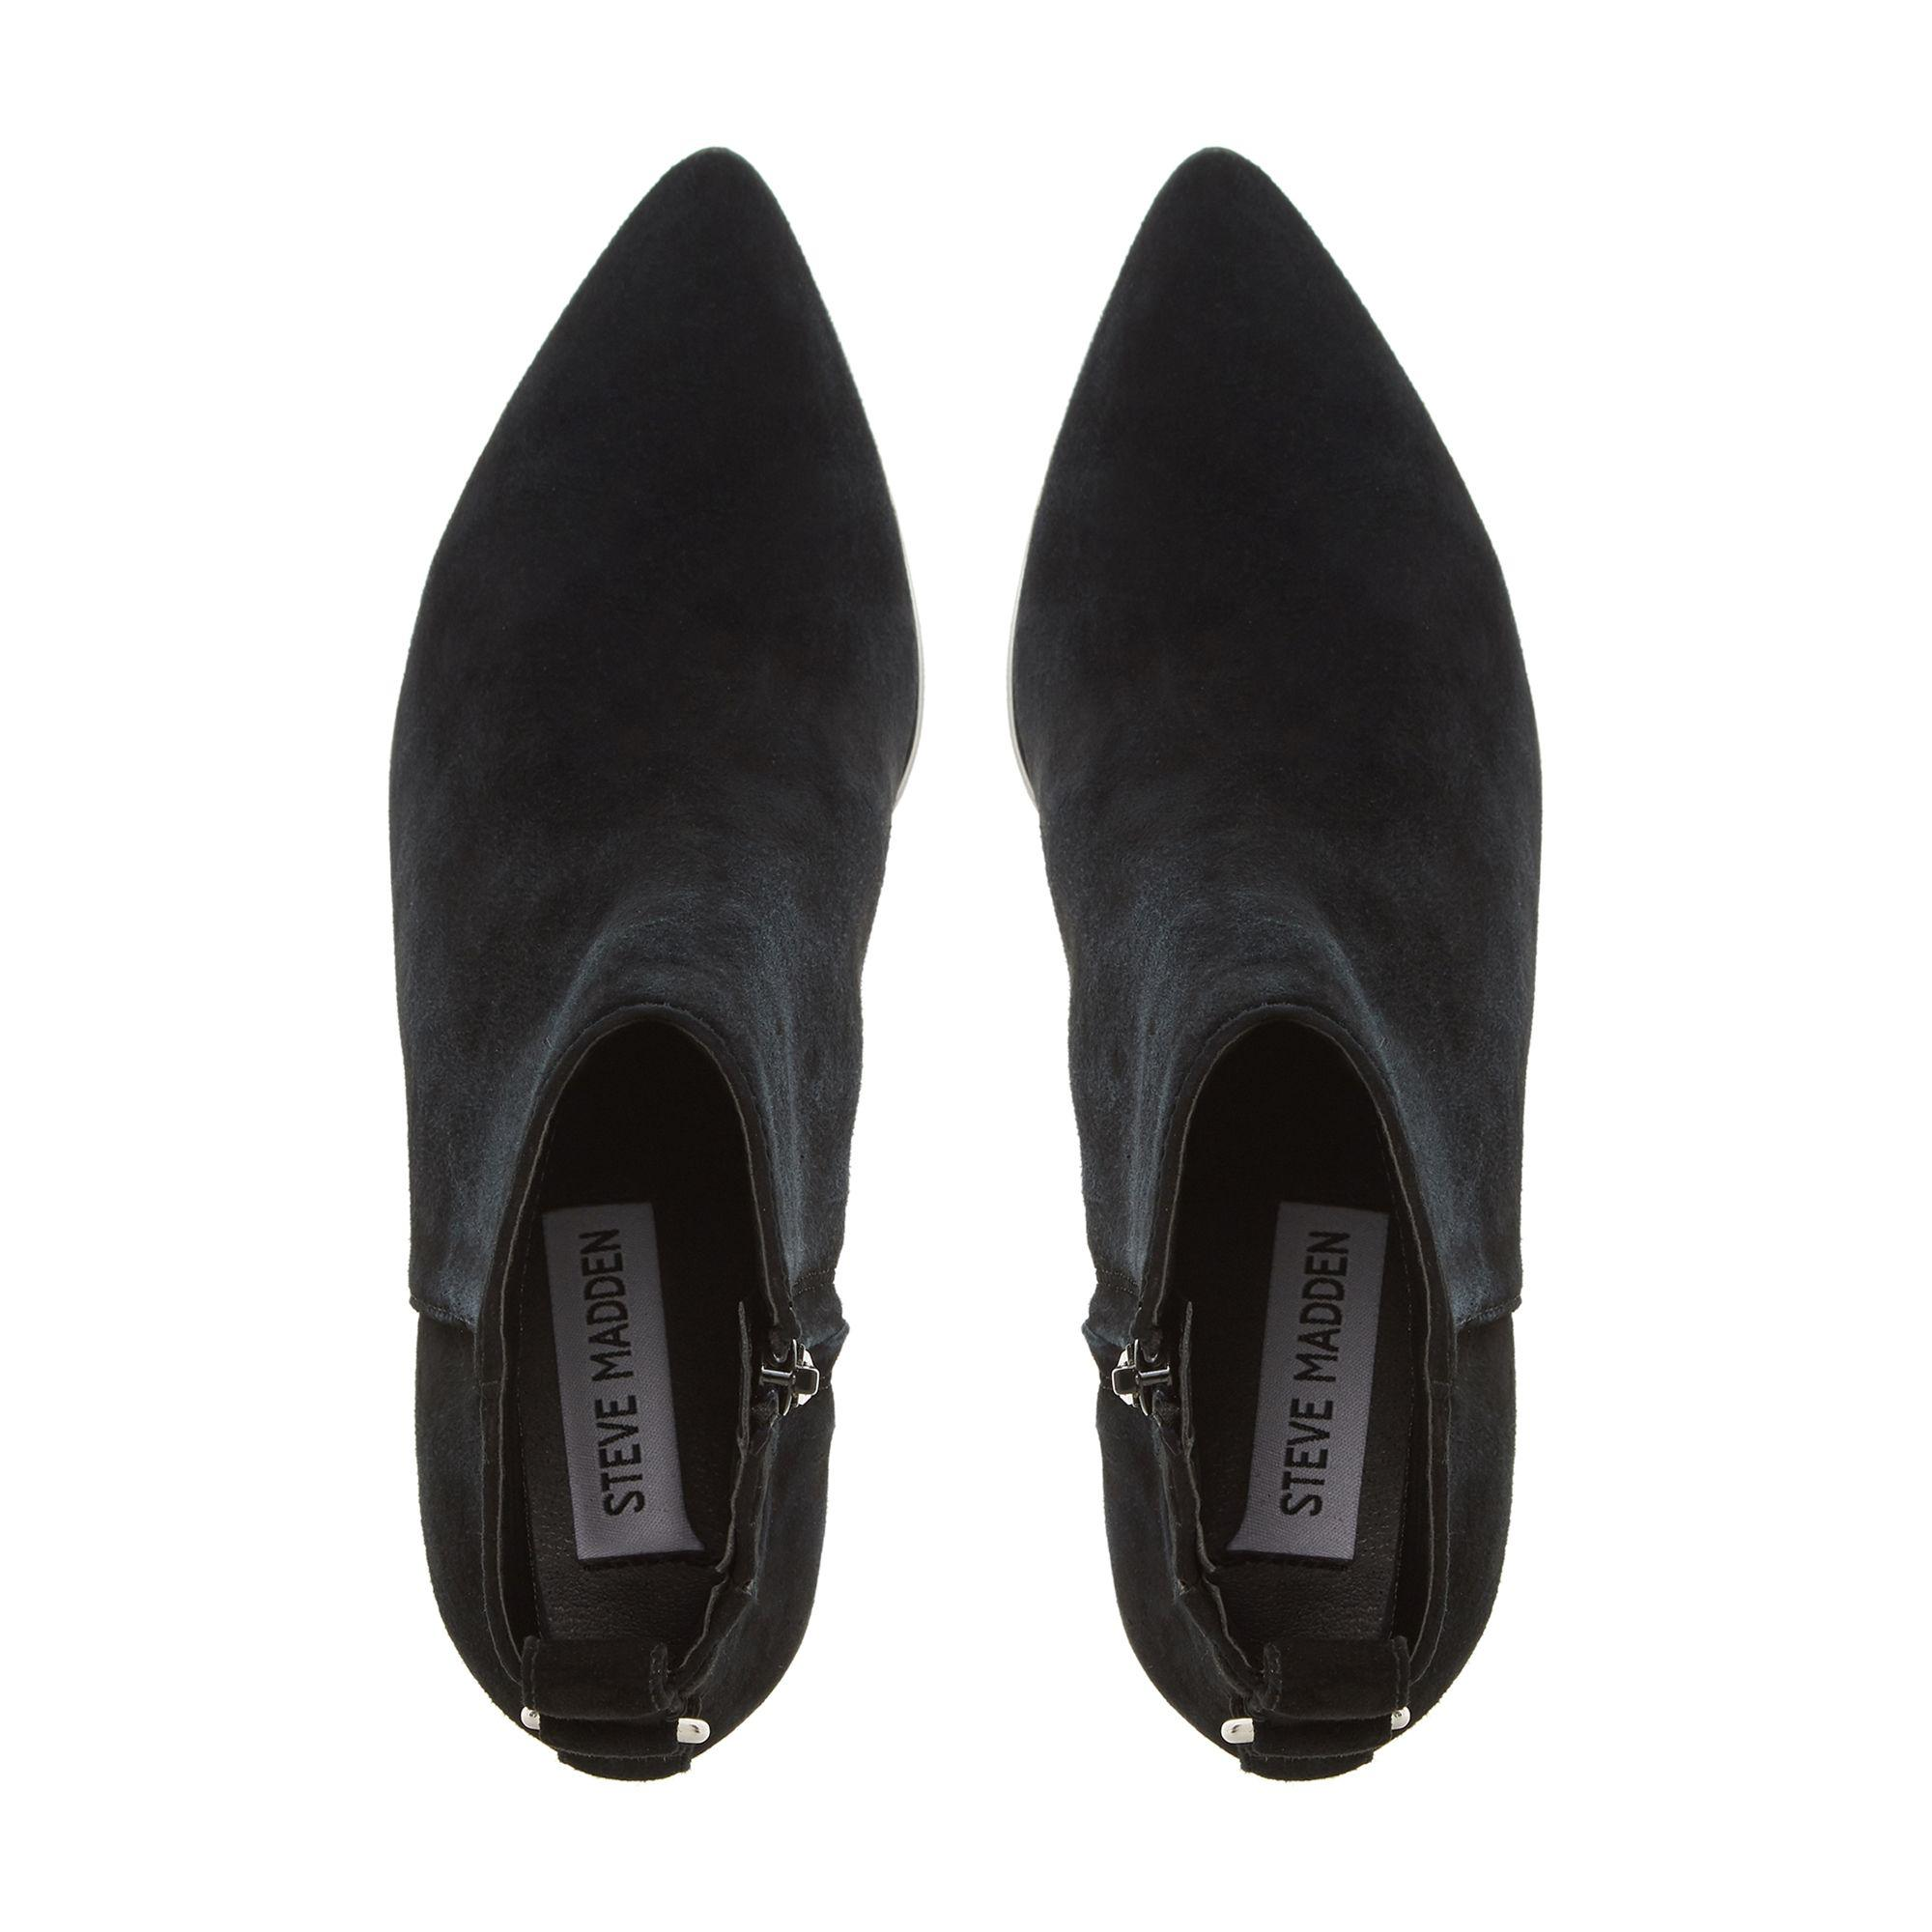 6ef352c8214 Steve Madden Black Suede  clover   Mid Block Heel Ankle Boots in ...